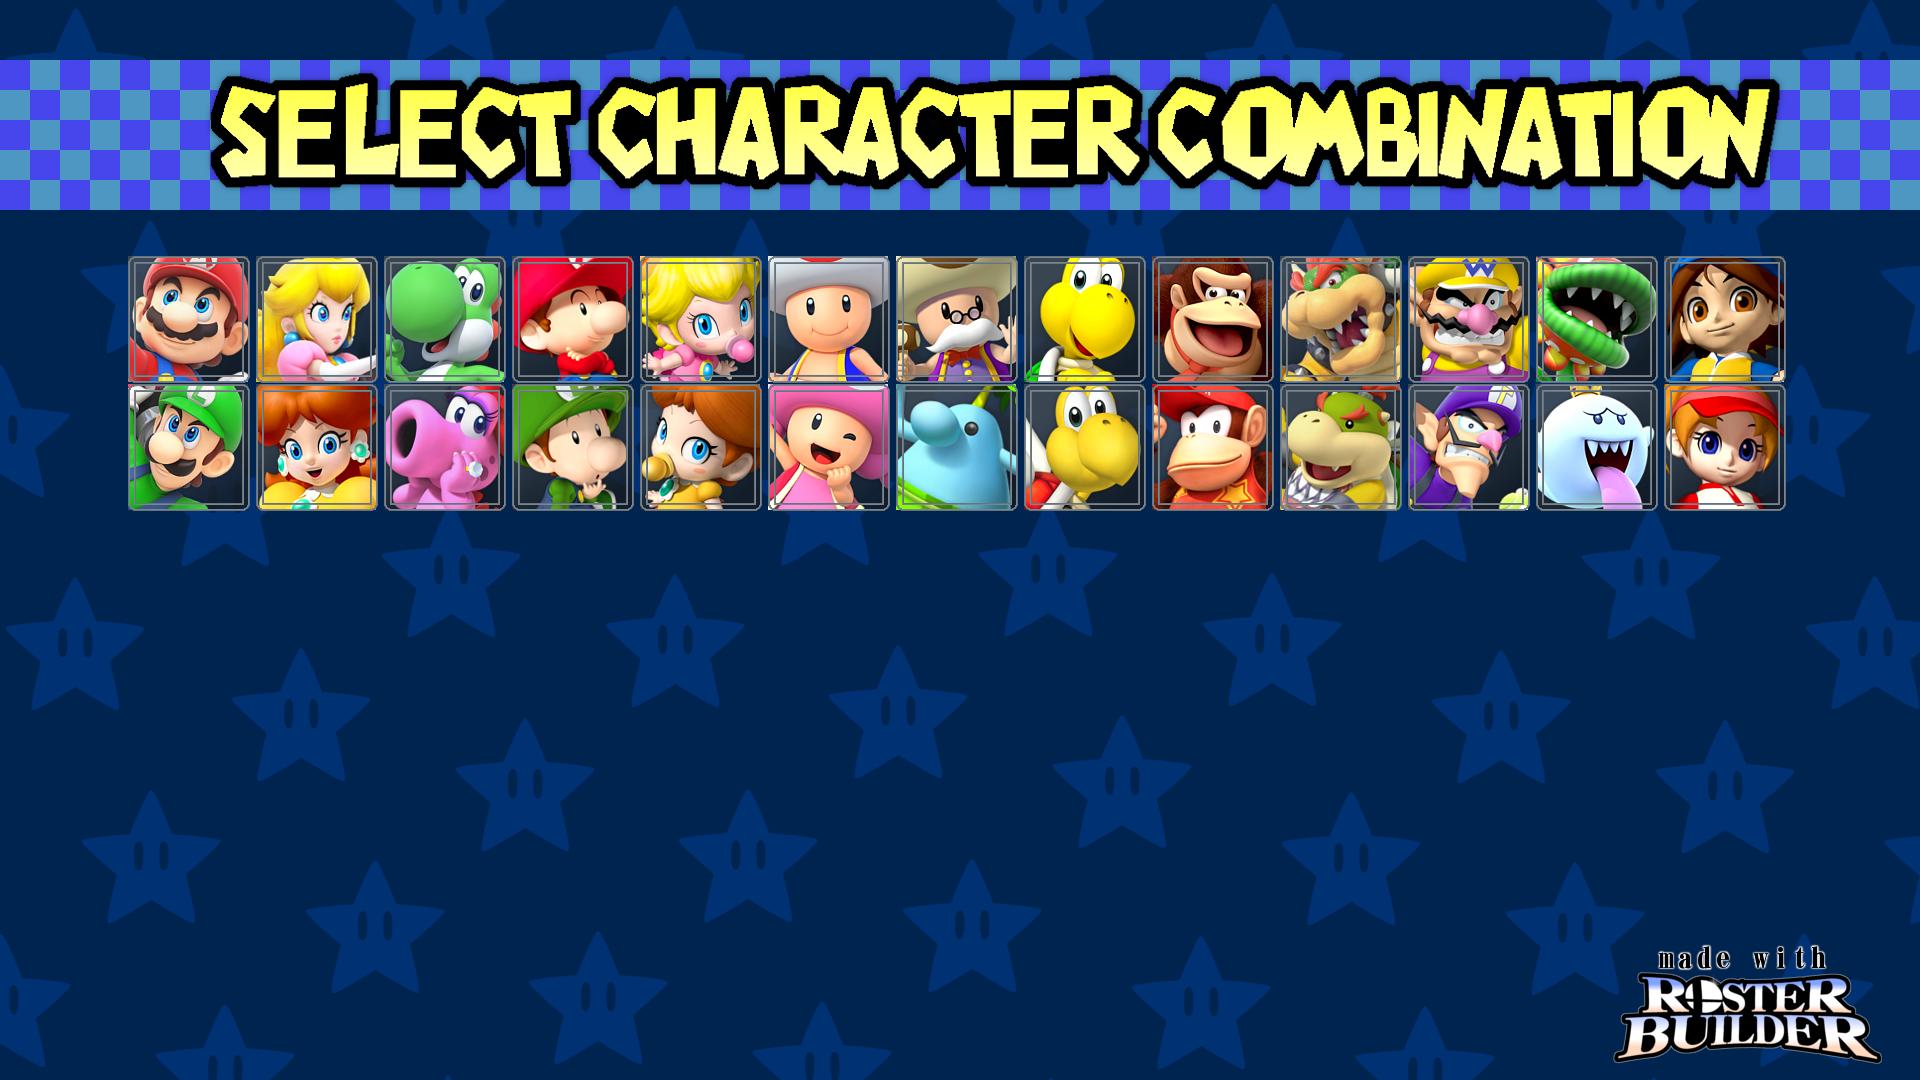 Roster Builder Mario Kart Double Dash Sample By Connorrentz